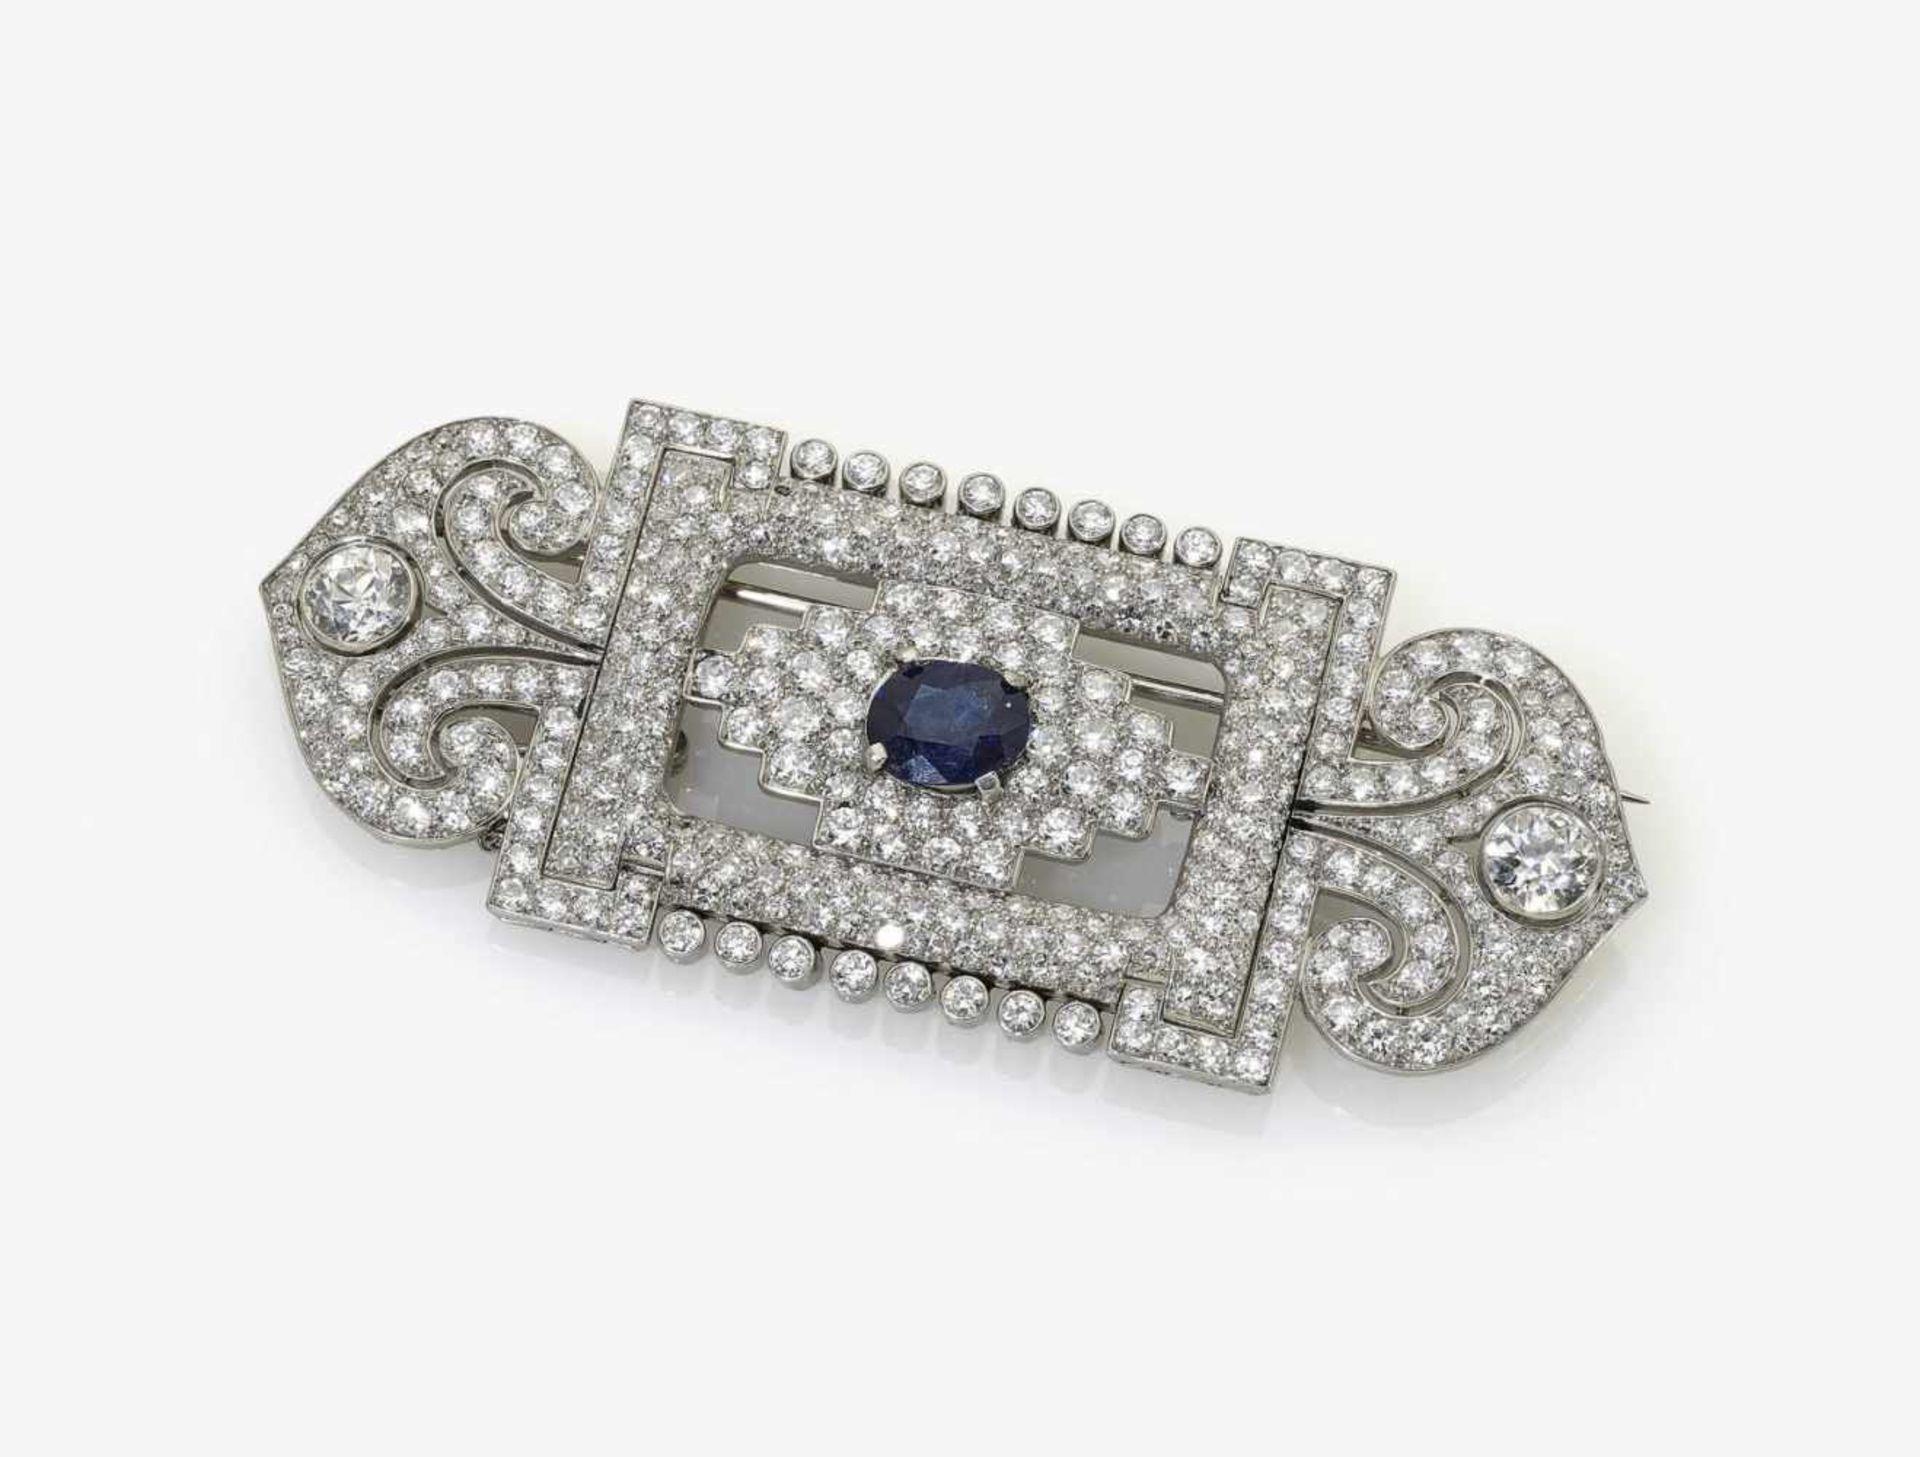 Los 1019 - A Diamond and Sapphire Brooch